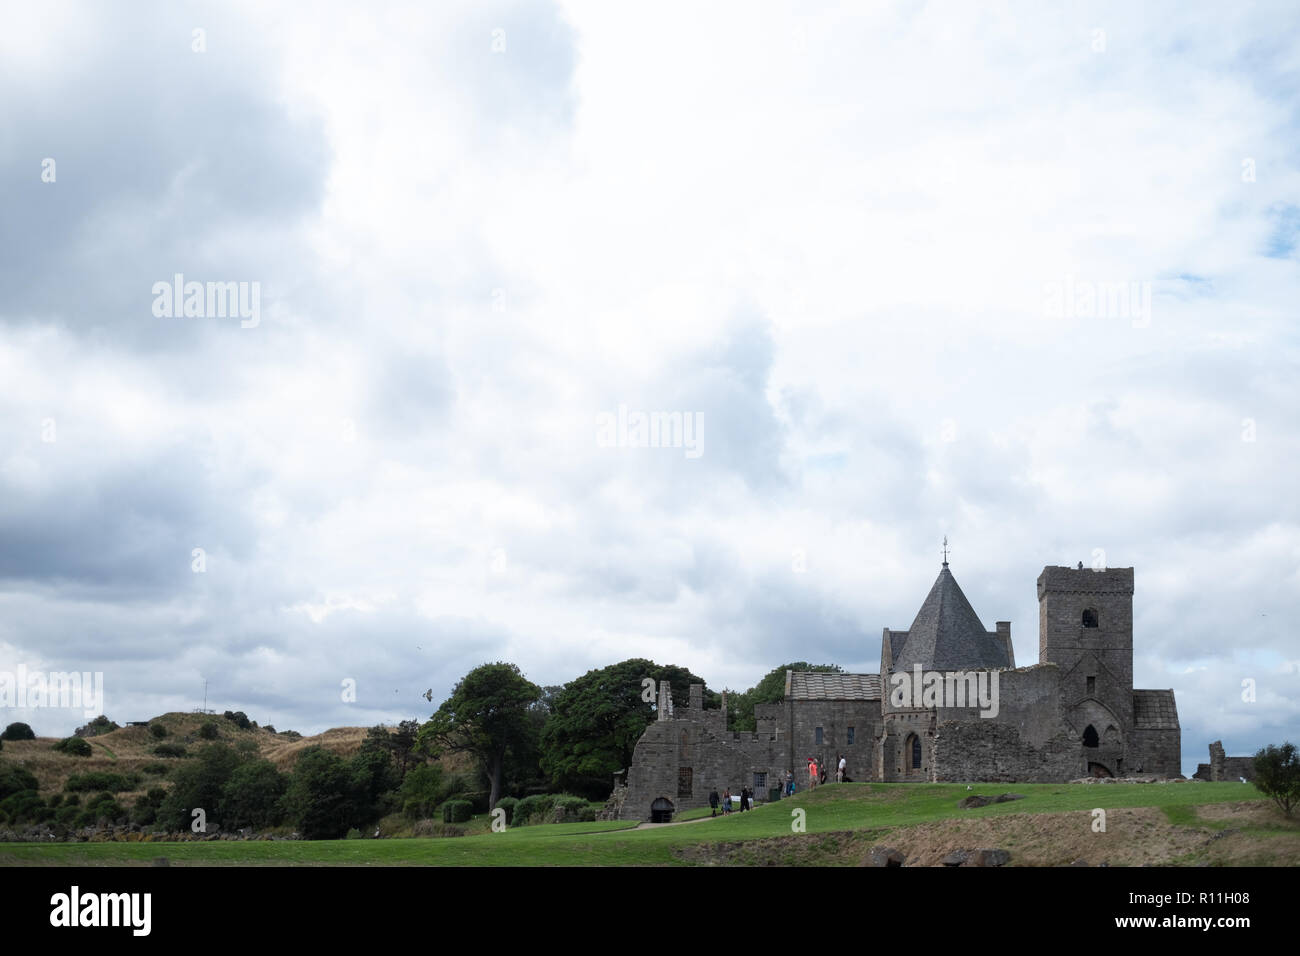 Inchcolm Abbey, Inchcolm, Fife, Scotland - Stock Image